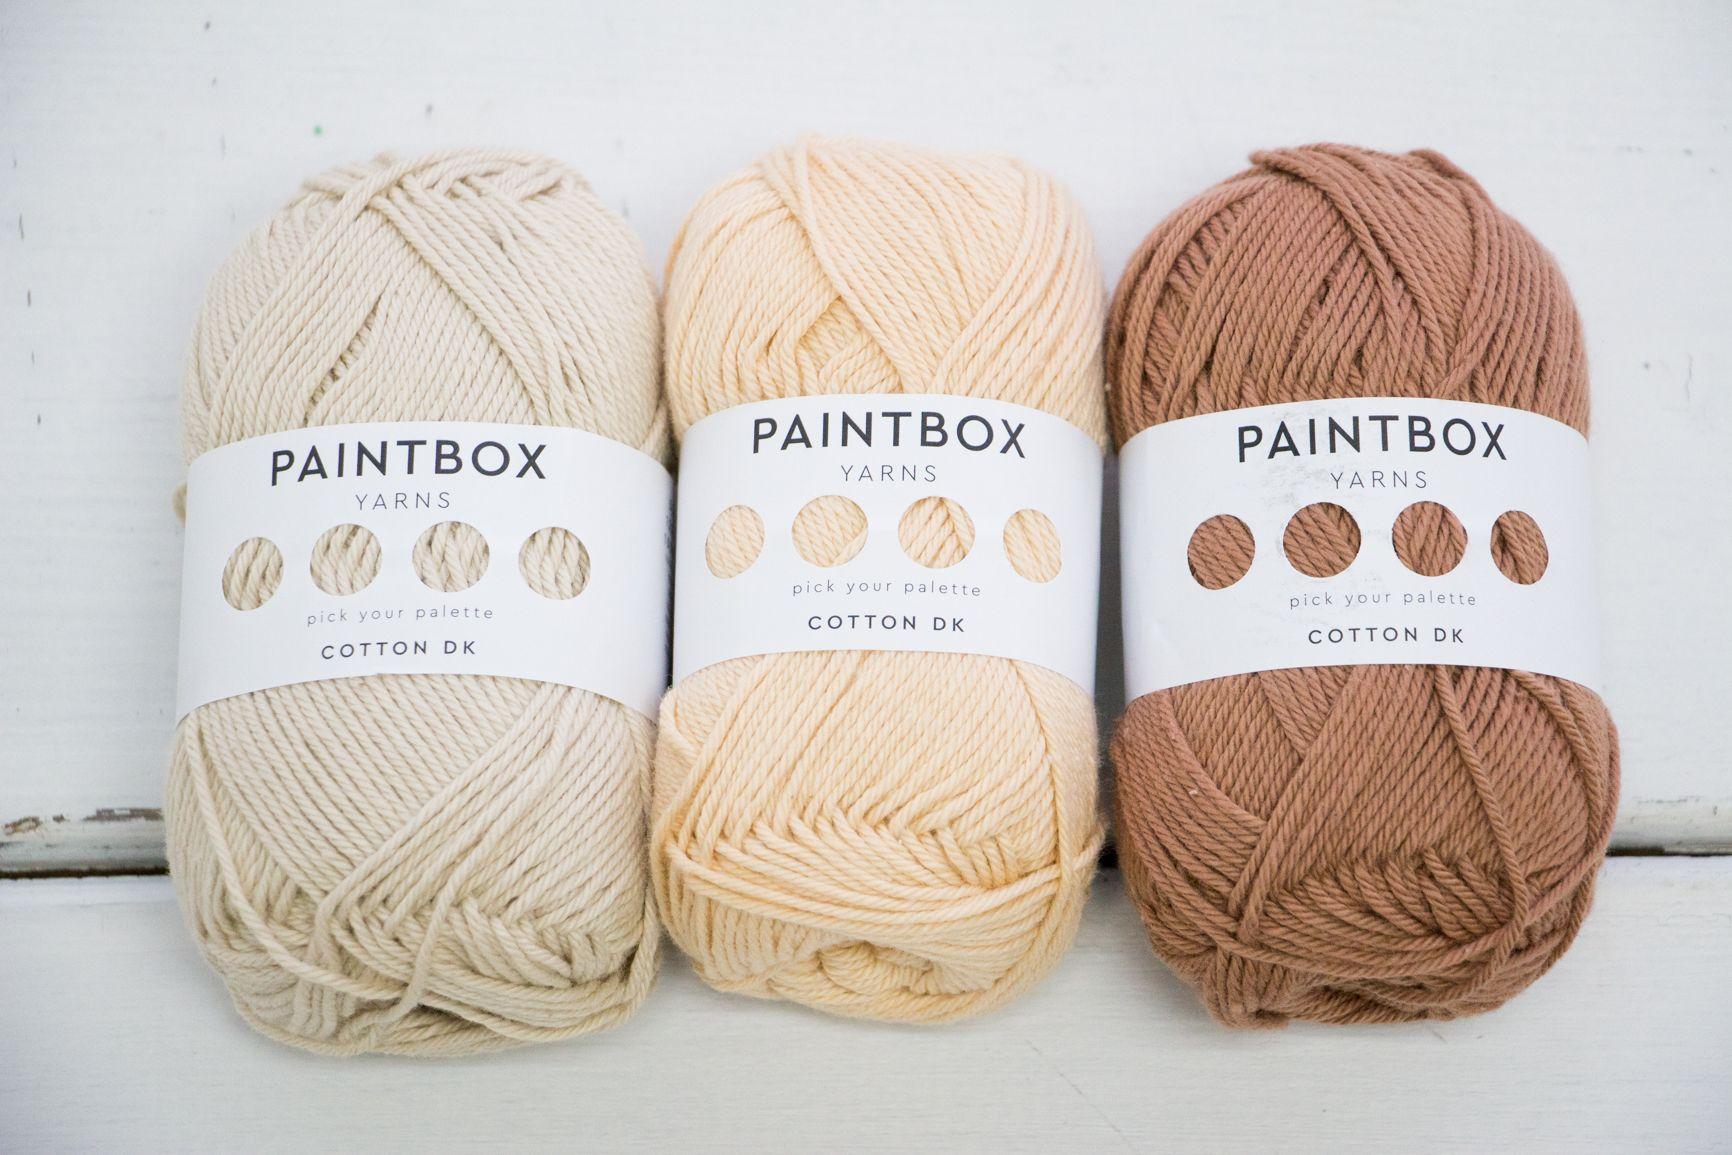 rose 100/% Alpaca Lace Weight Yarn 100g//50g rose//alpaga laine